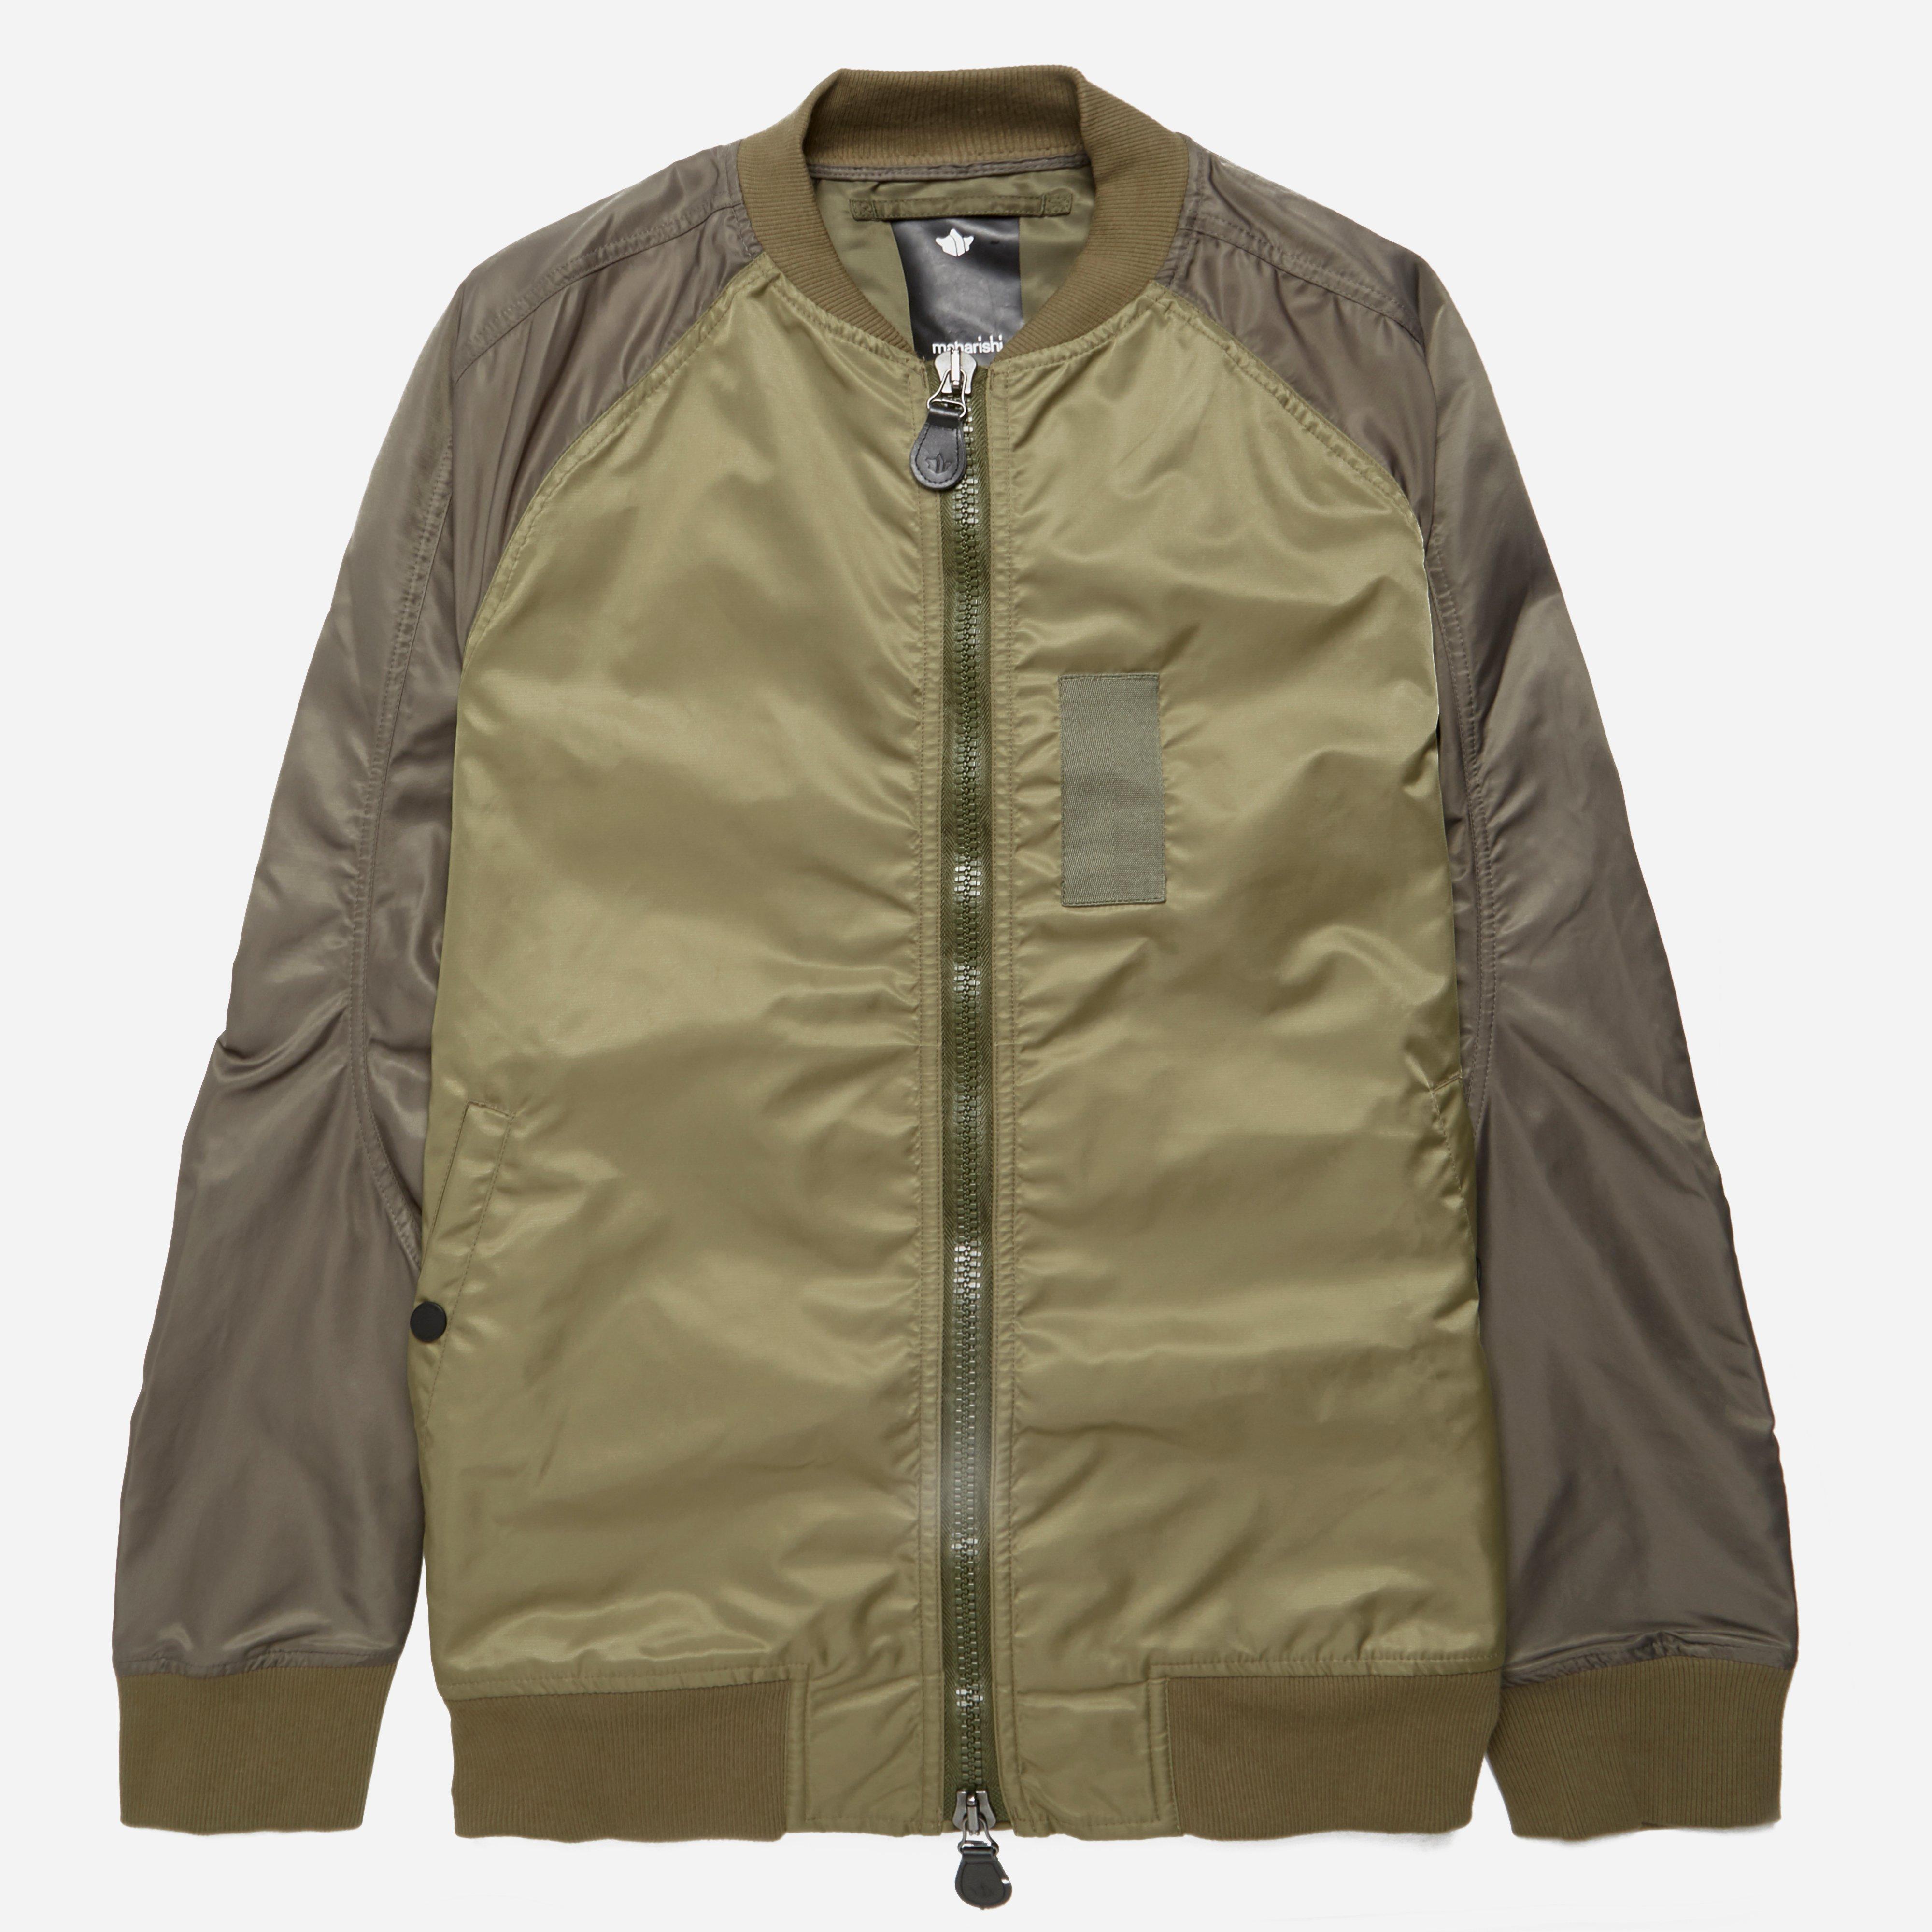 maharishi Ergonomic MA Jacket